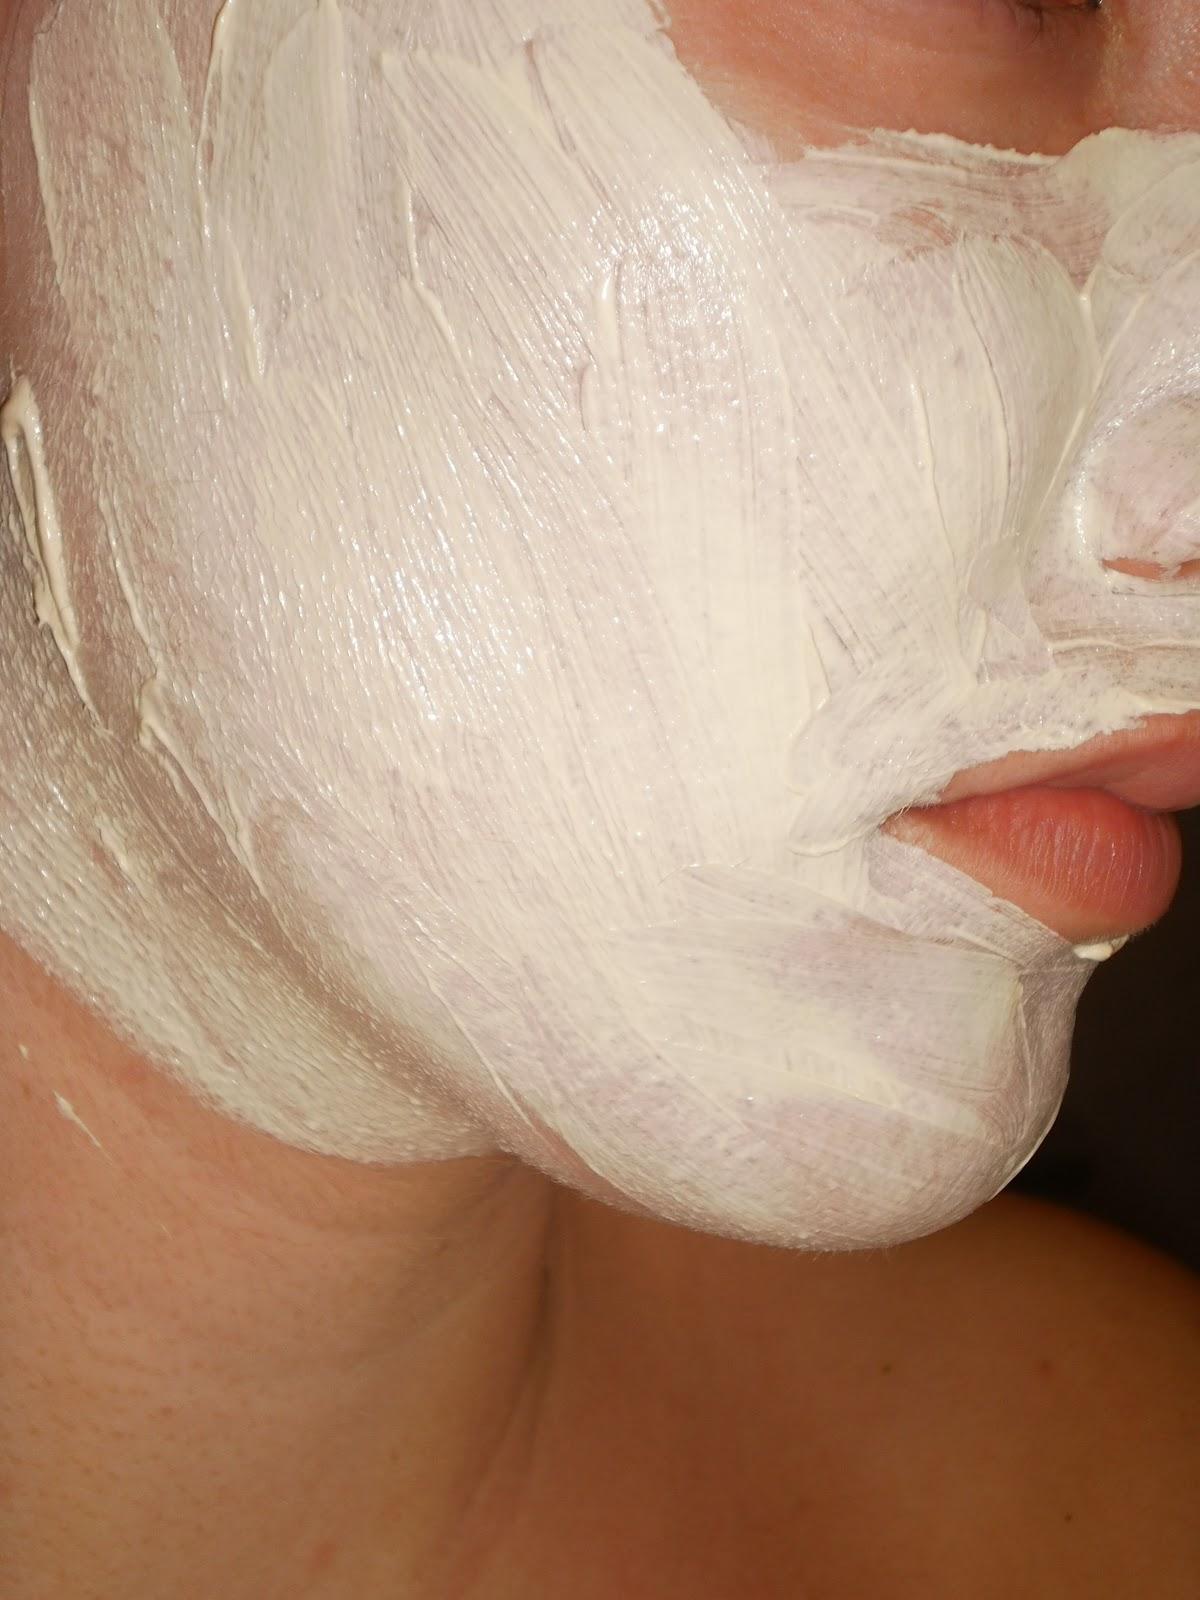 wit masker rond mond